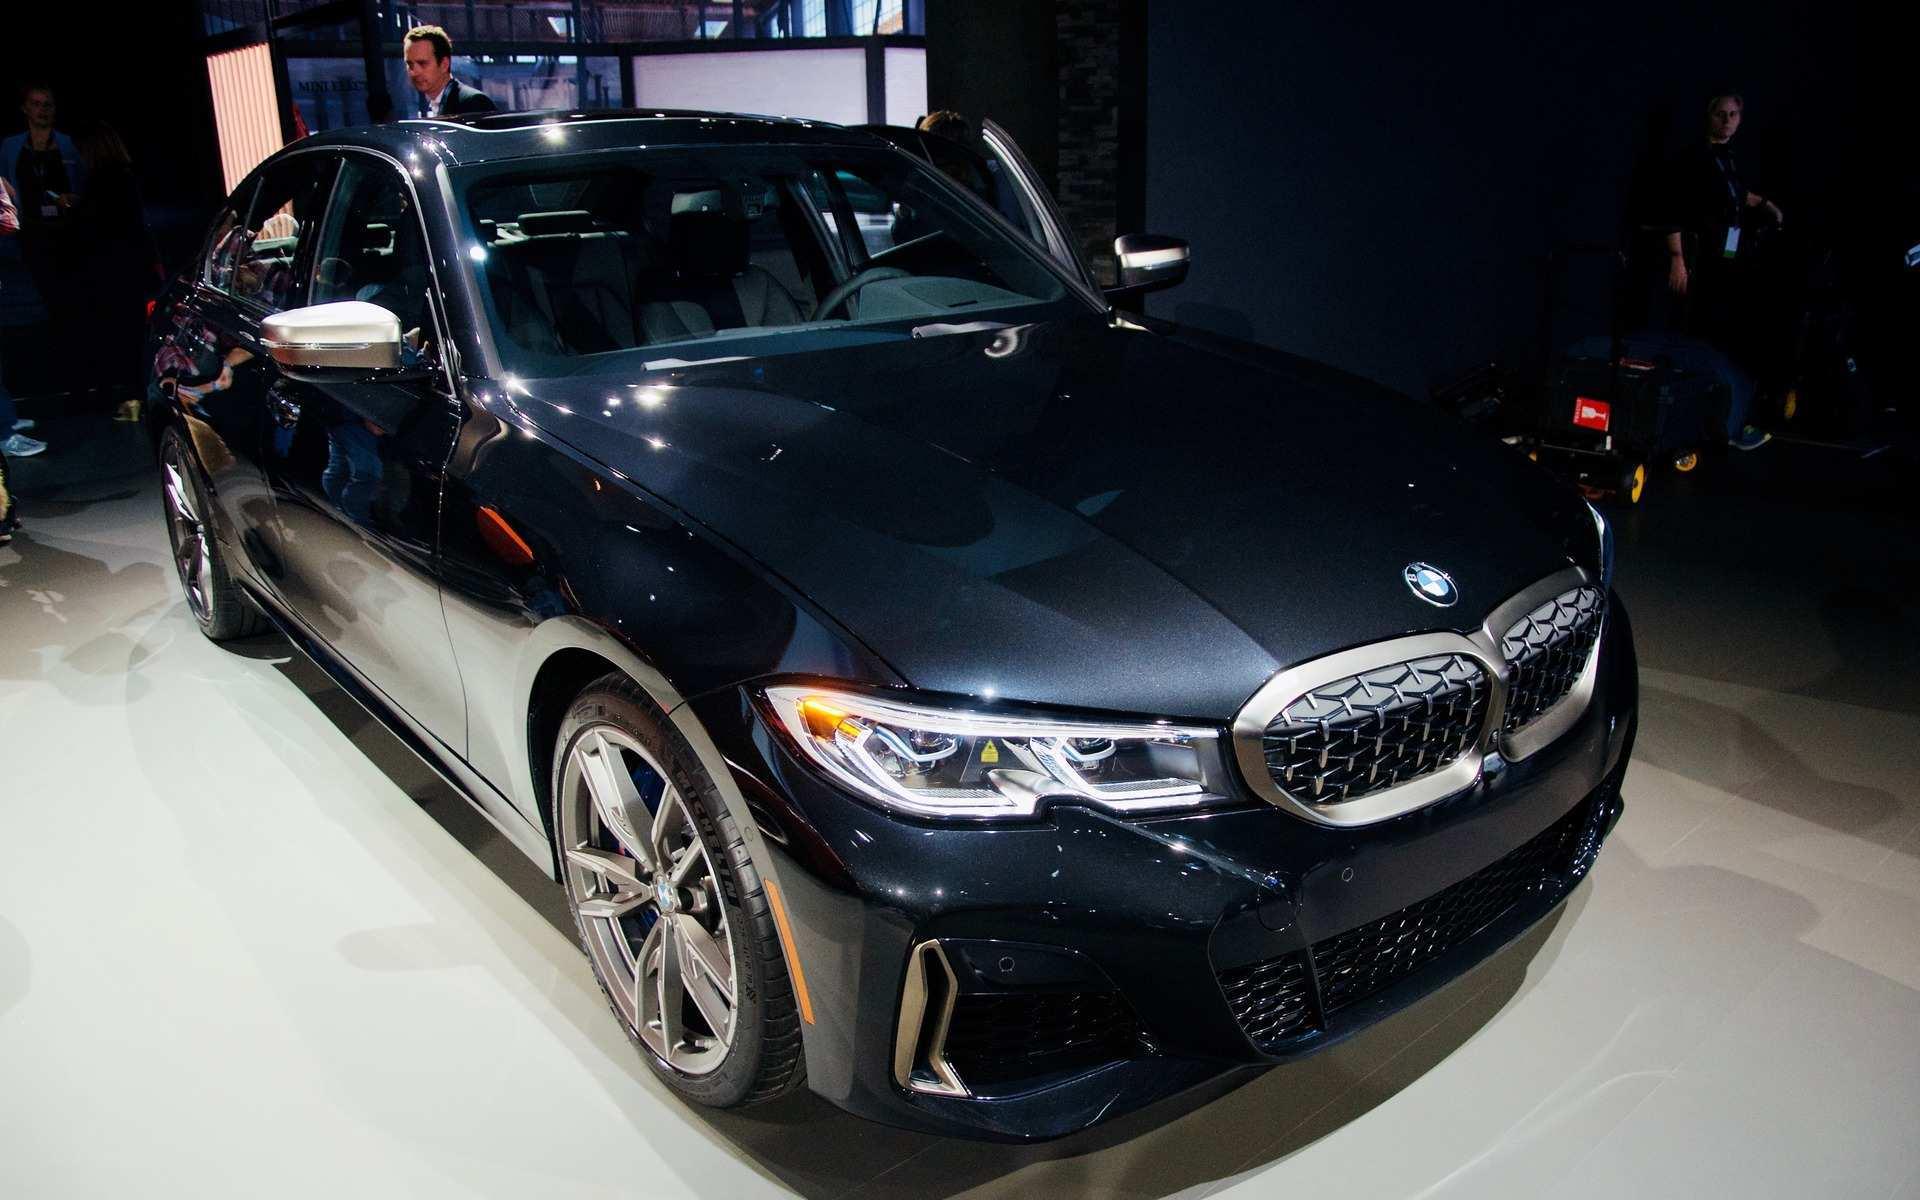 42 Concept of BMW Qui Sort En 2020 Performance and New Engine with BMW Qui Sort En 2020